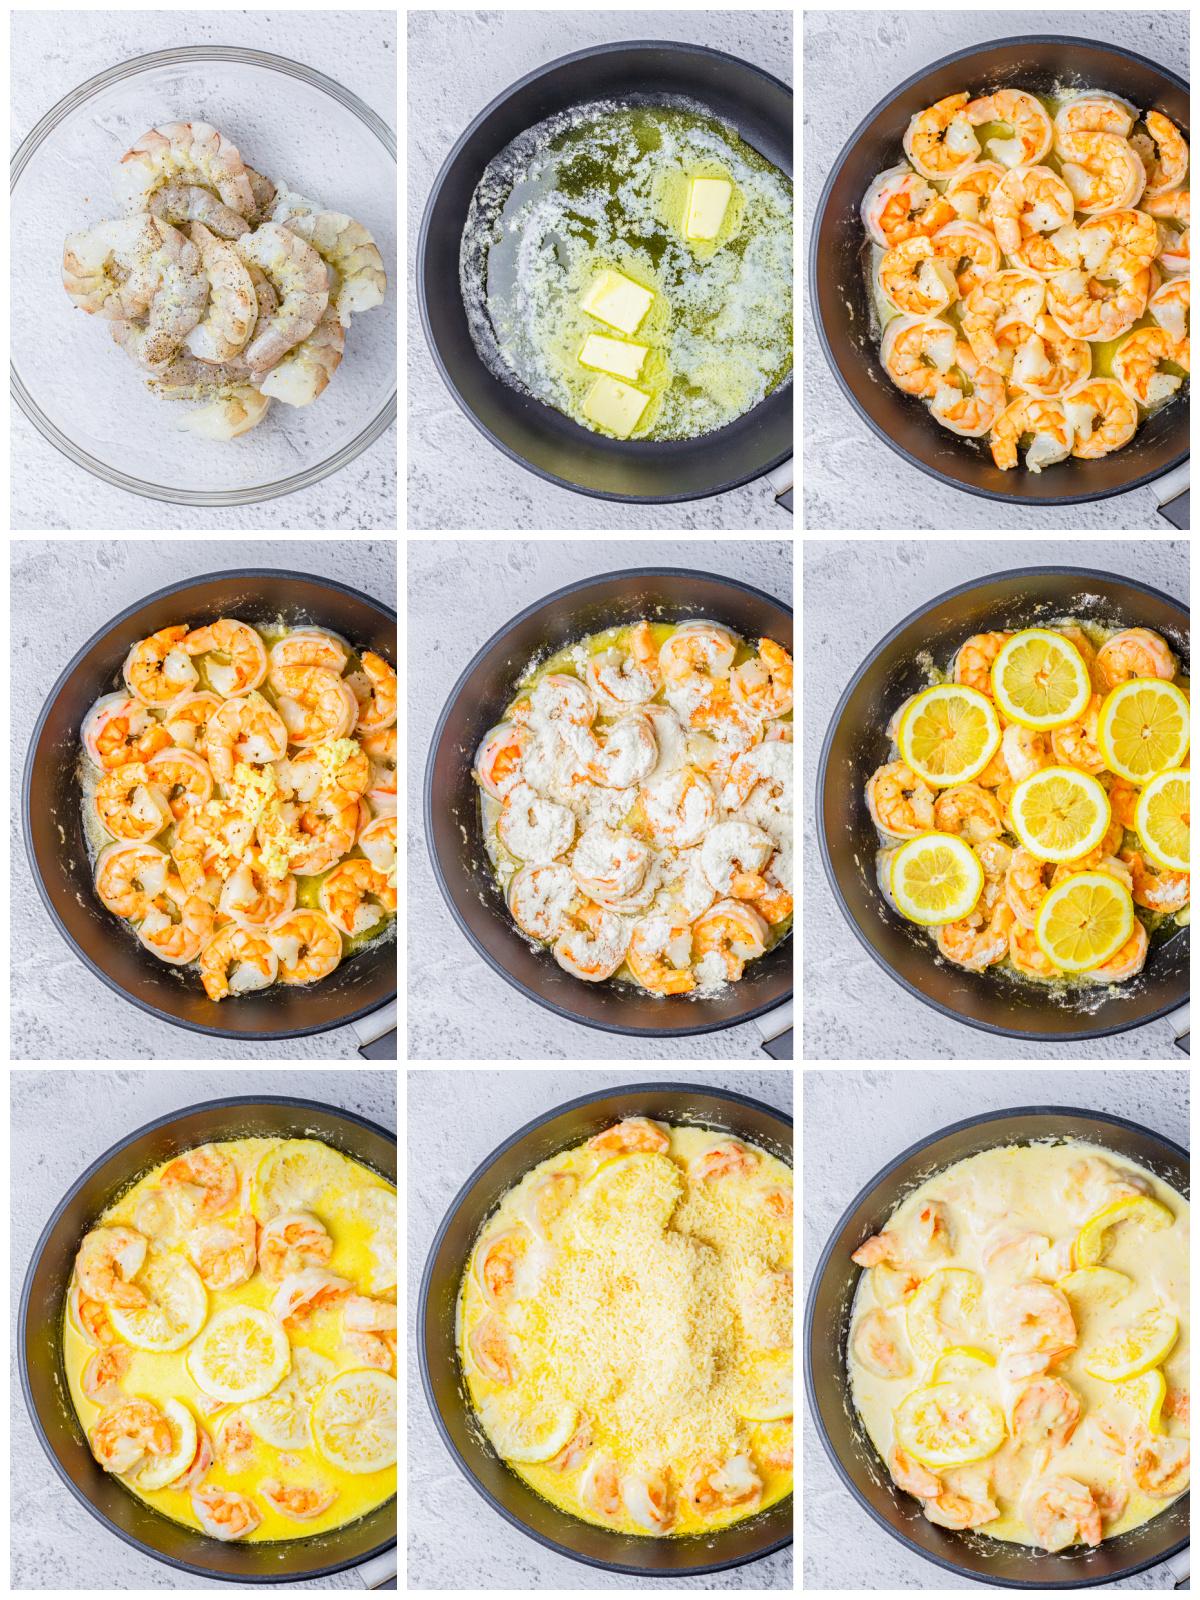 Step by step photos on how to make Creamy Lemon Shrimp